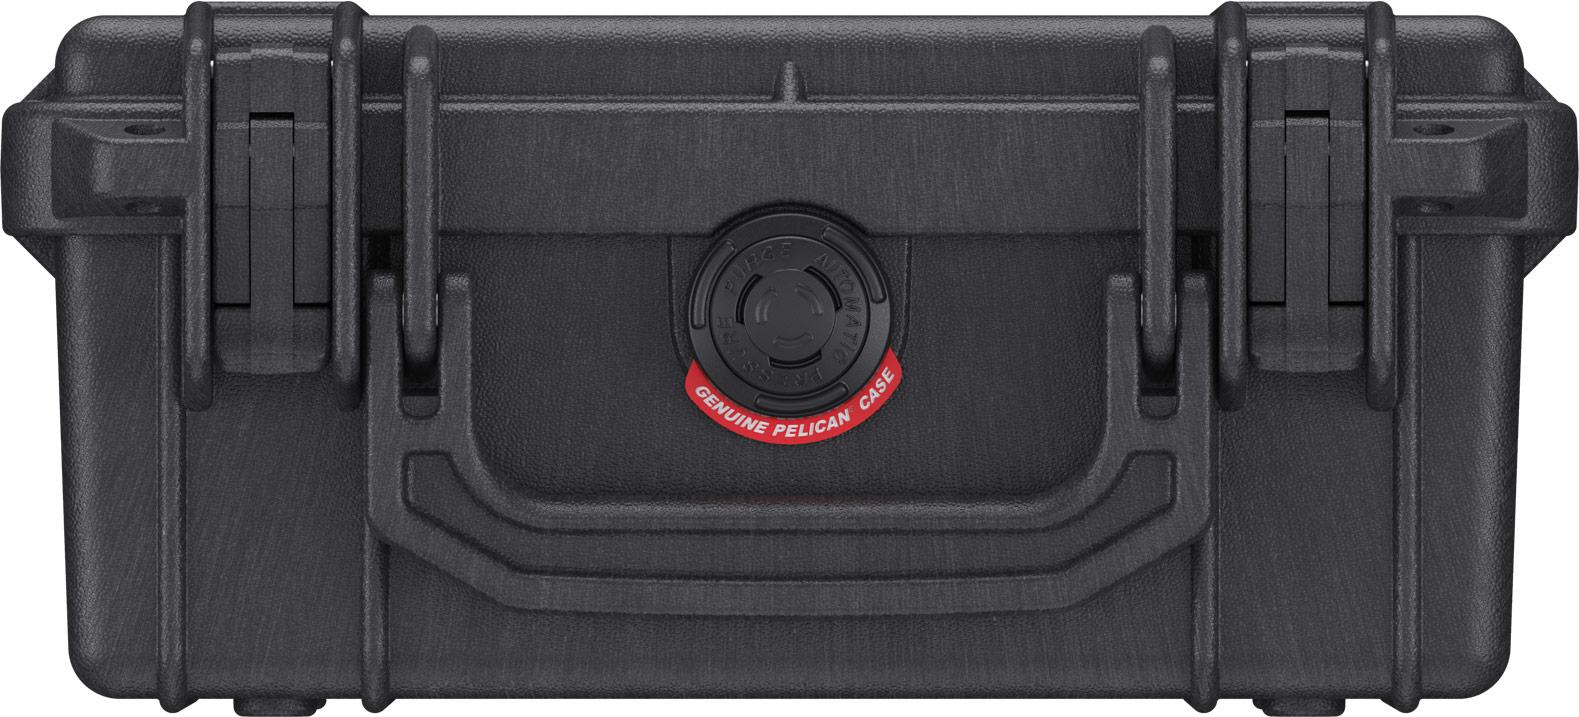 pelican protector 1150 black watertight hard case